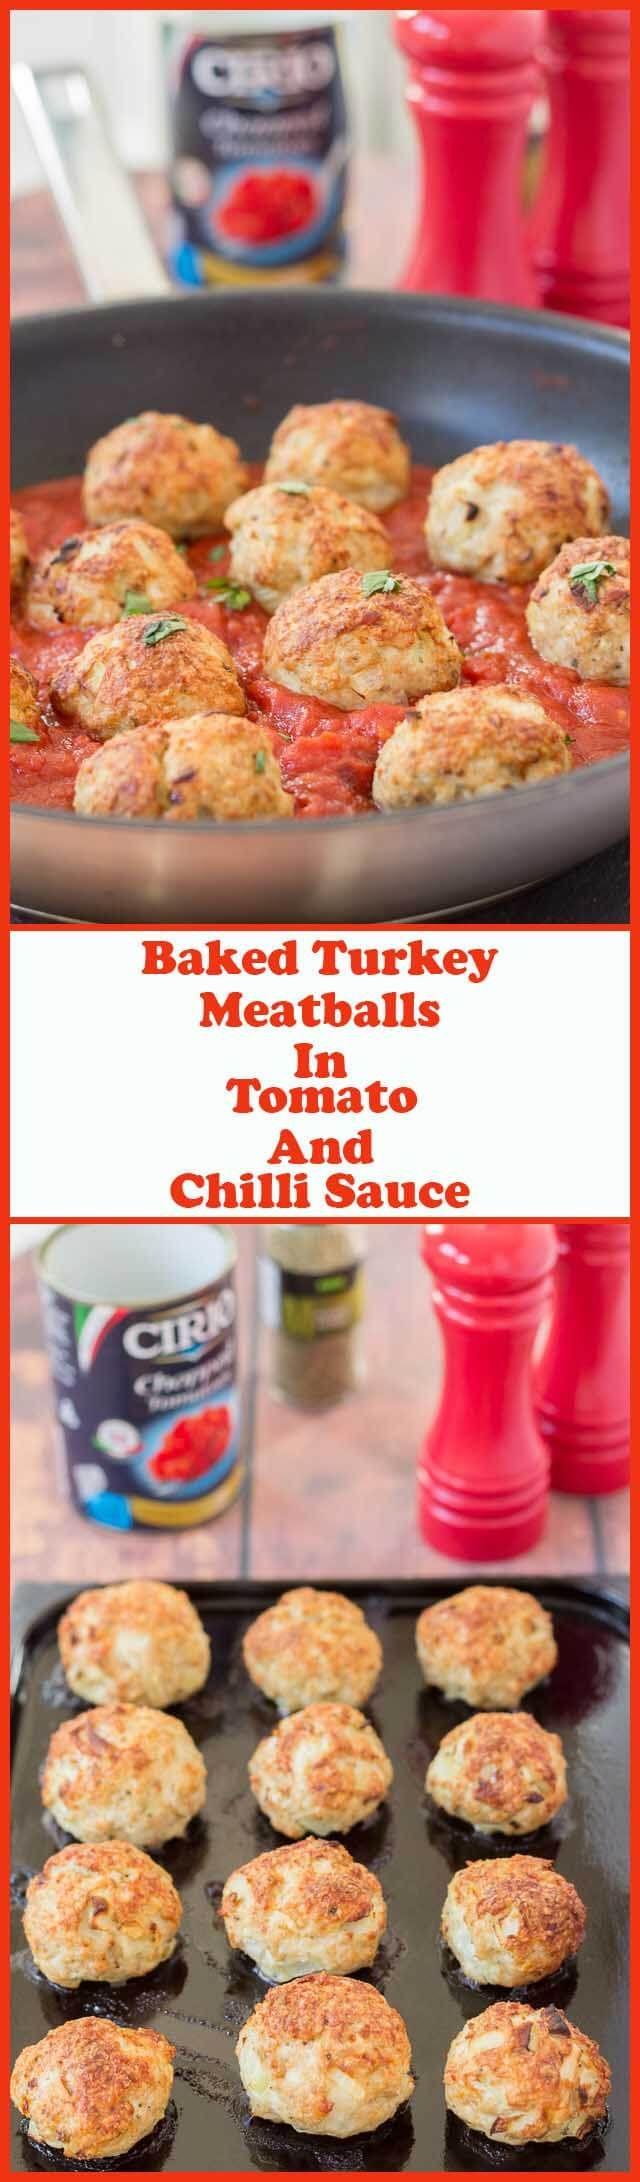 Baked Turkey Meatballs In Tomato And Chilli Sauce | Recipe ...